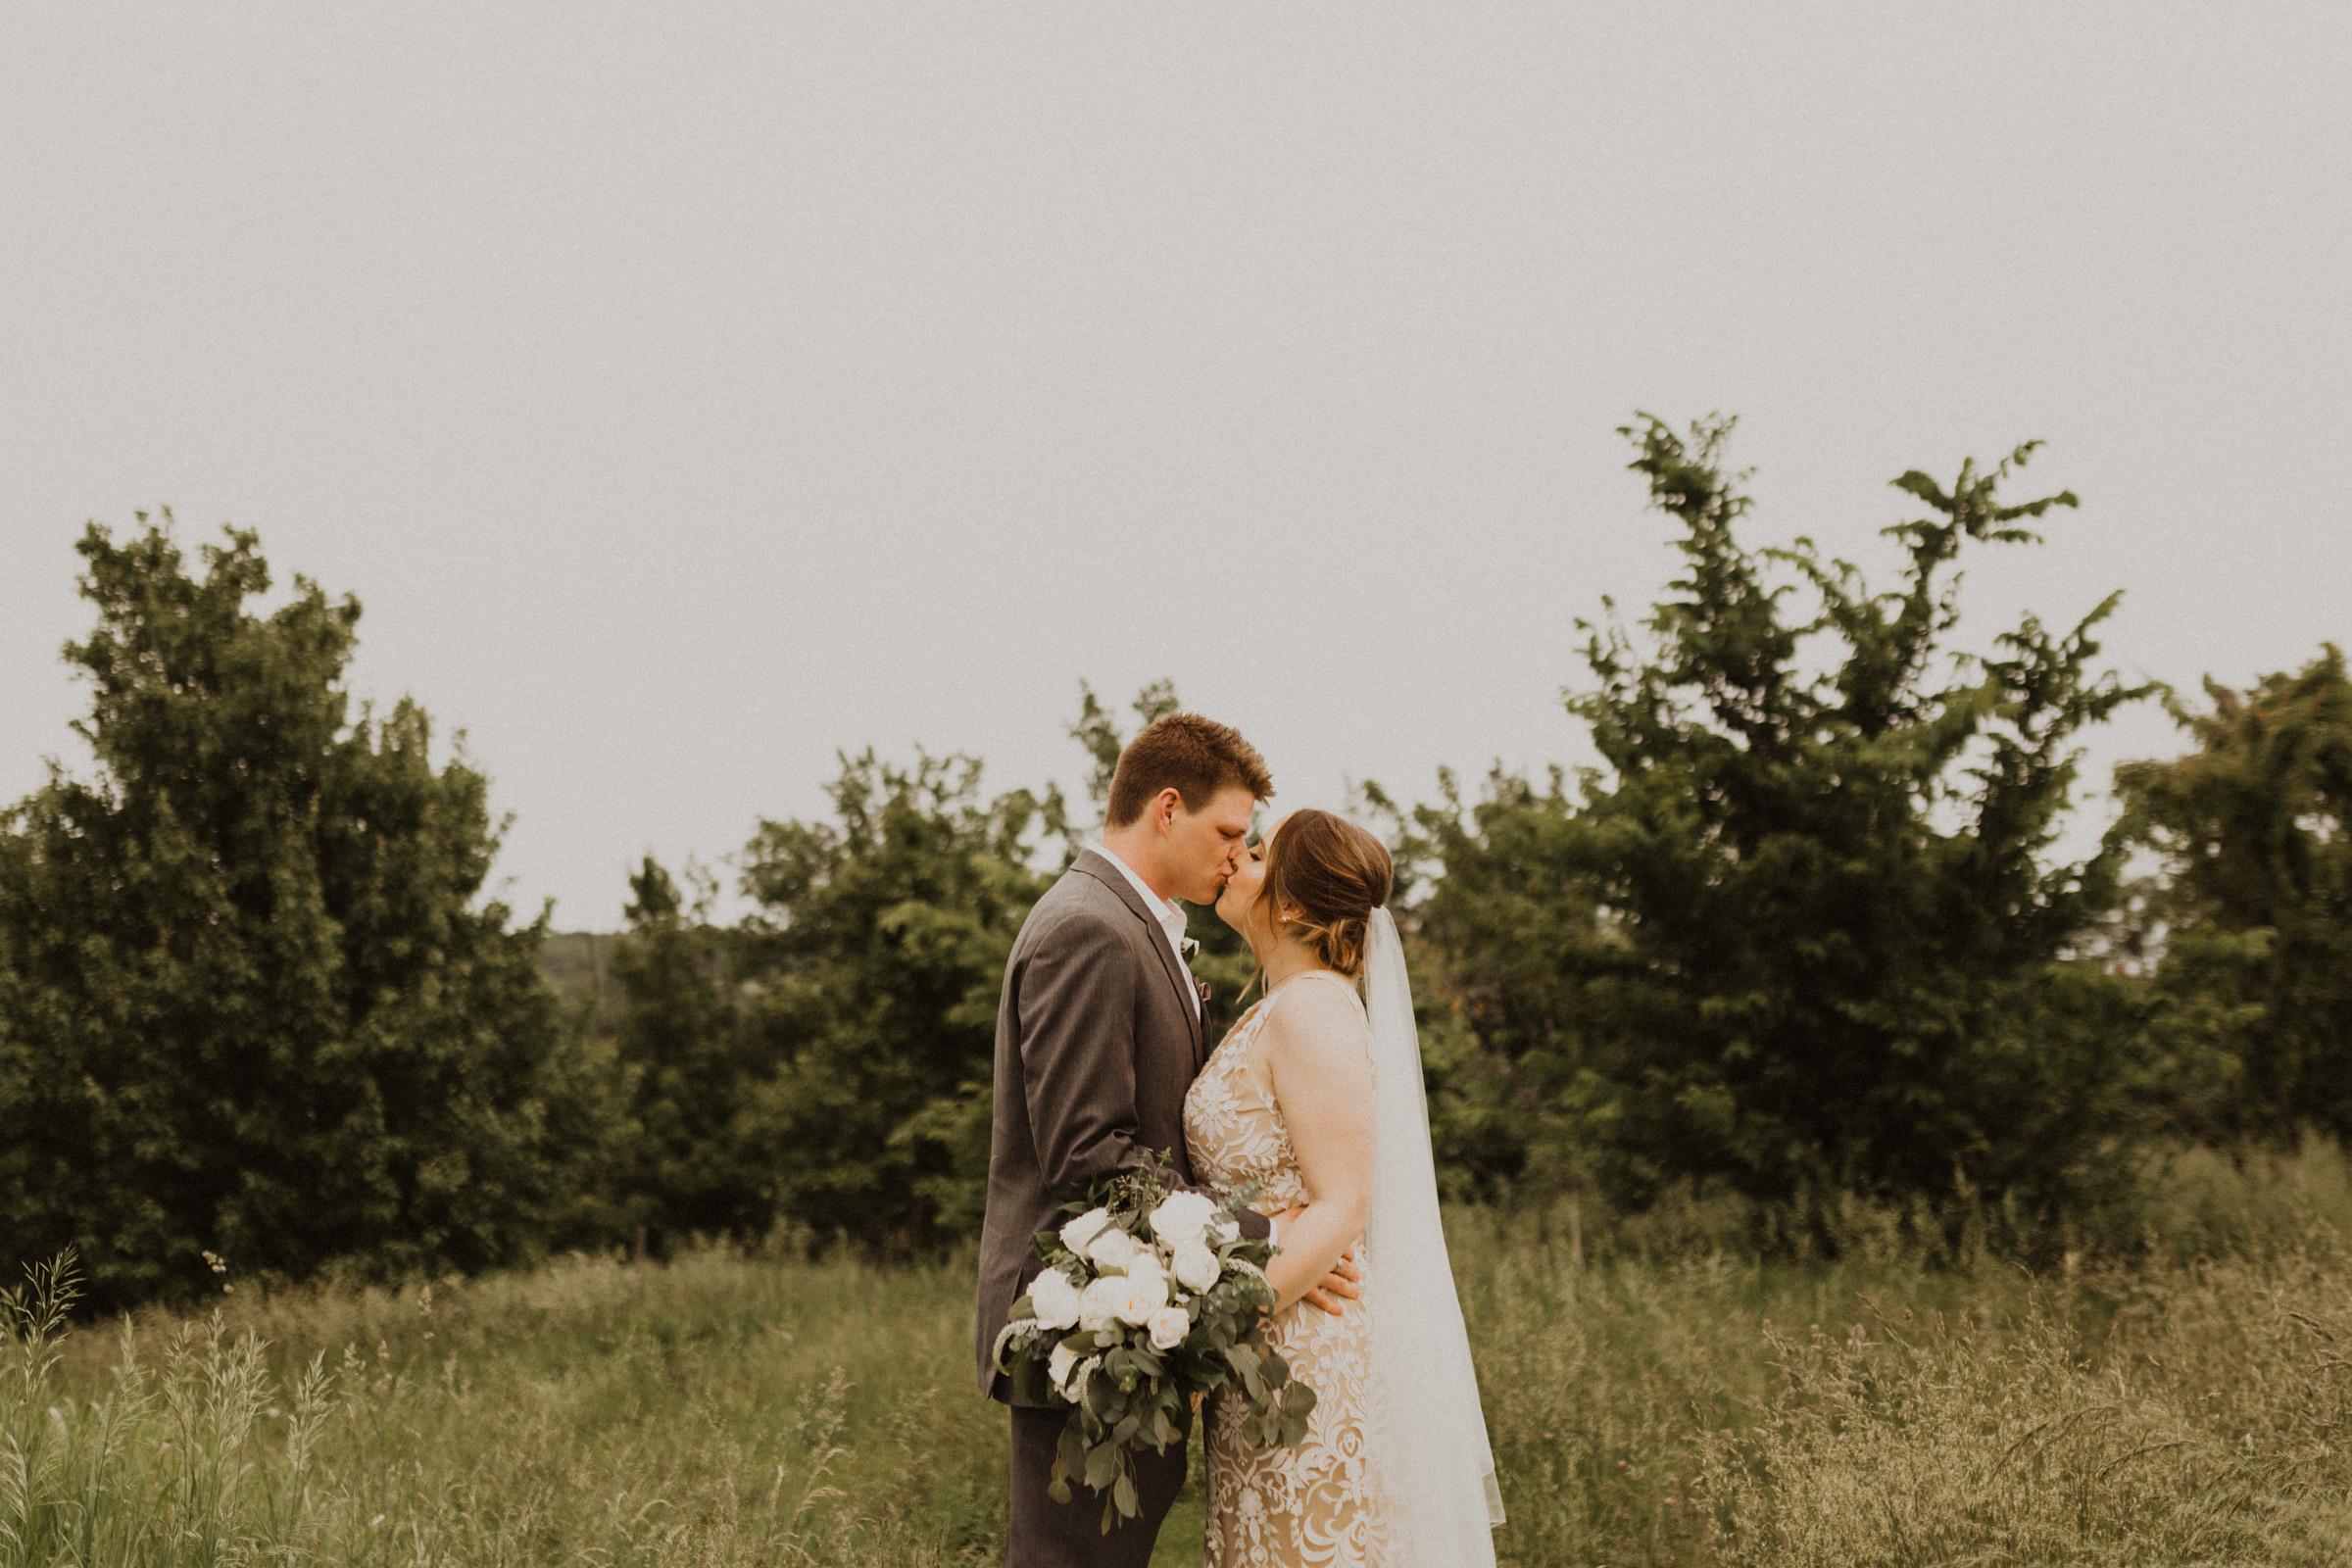 alyssa barletter photography weston red barn farm timberbarn summer outdoor wedding-18.jpg